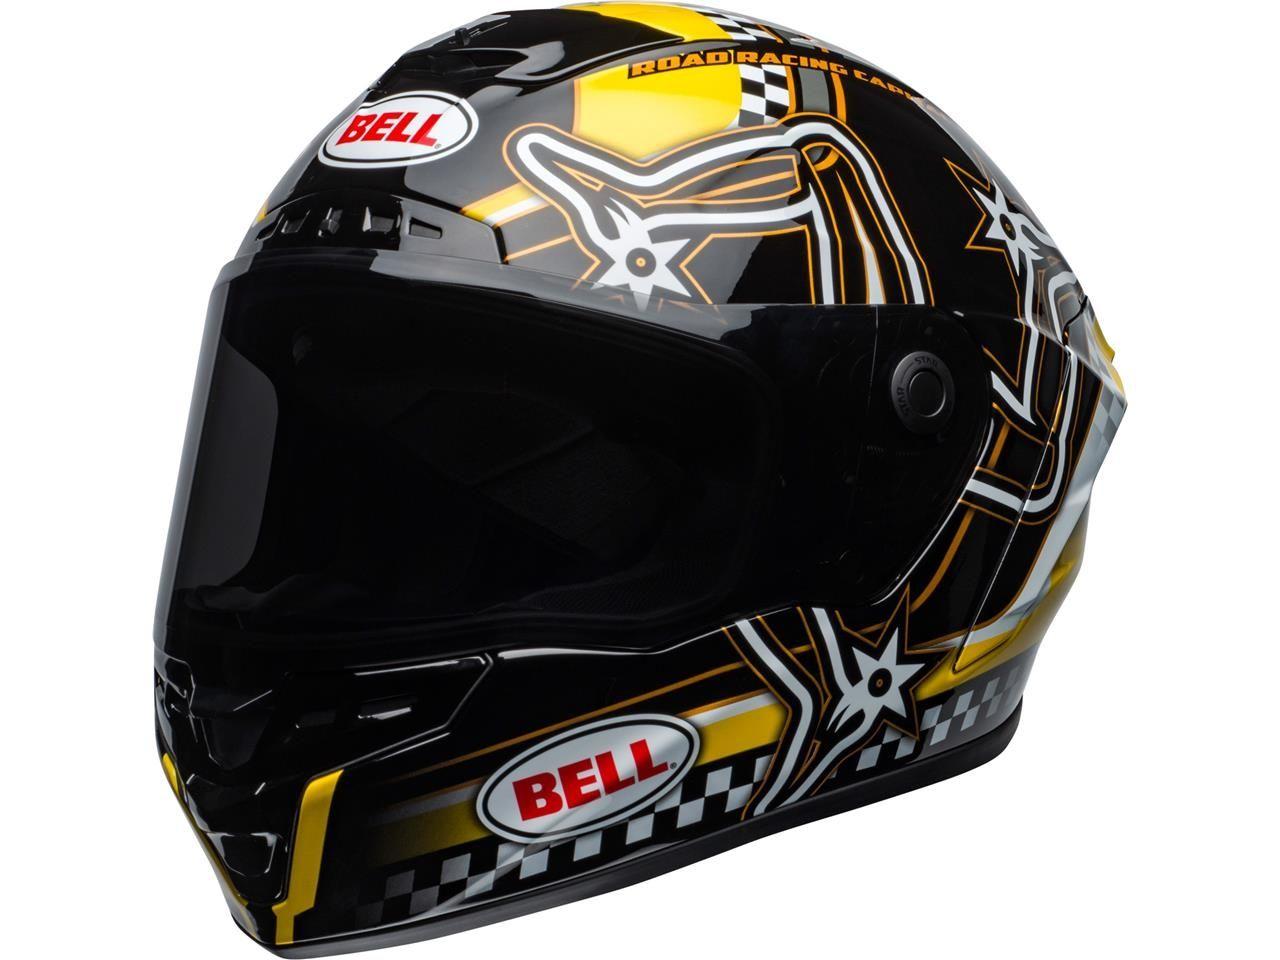 Bell Star DLX MIPS Integraalhelm Isle of Man 2020 Gloss Black/Yellow